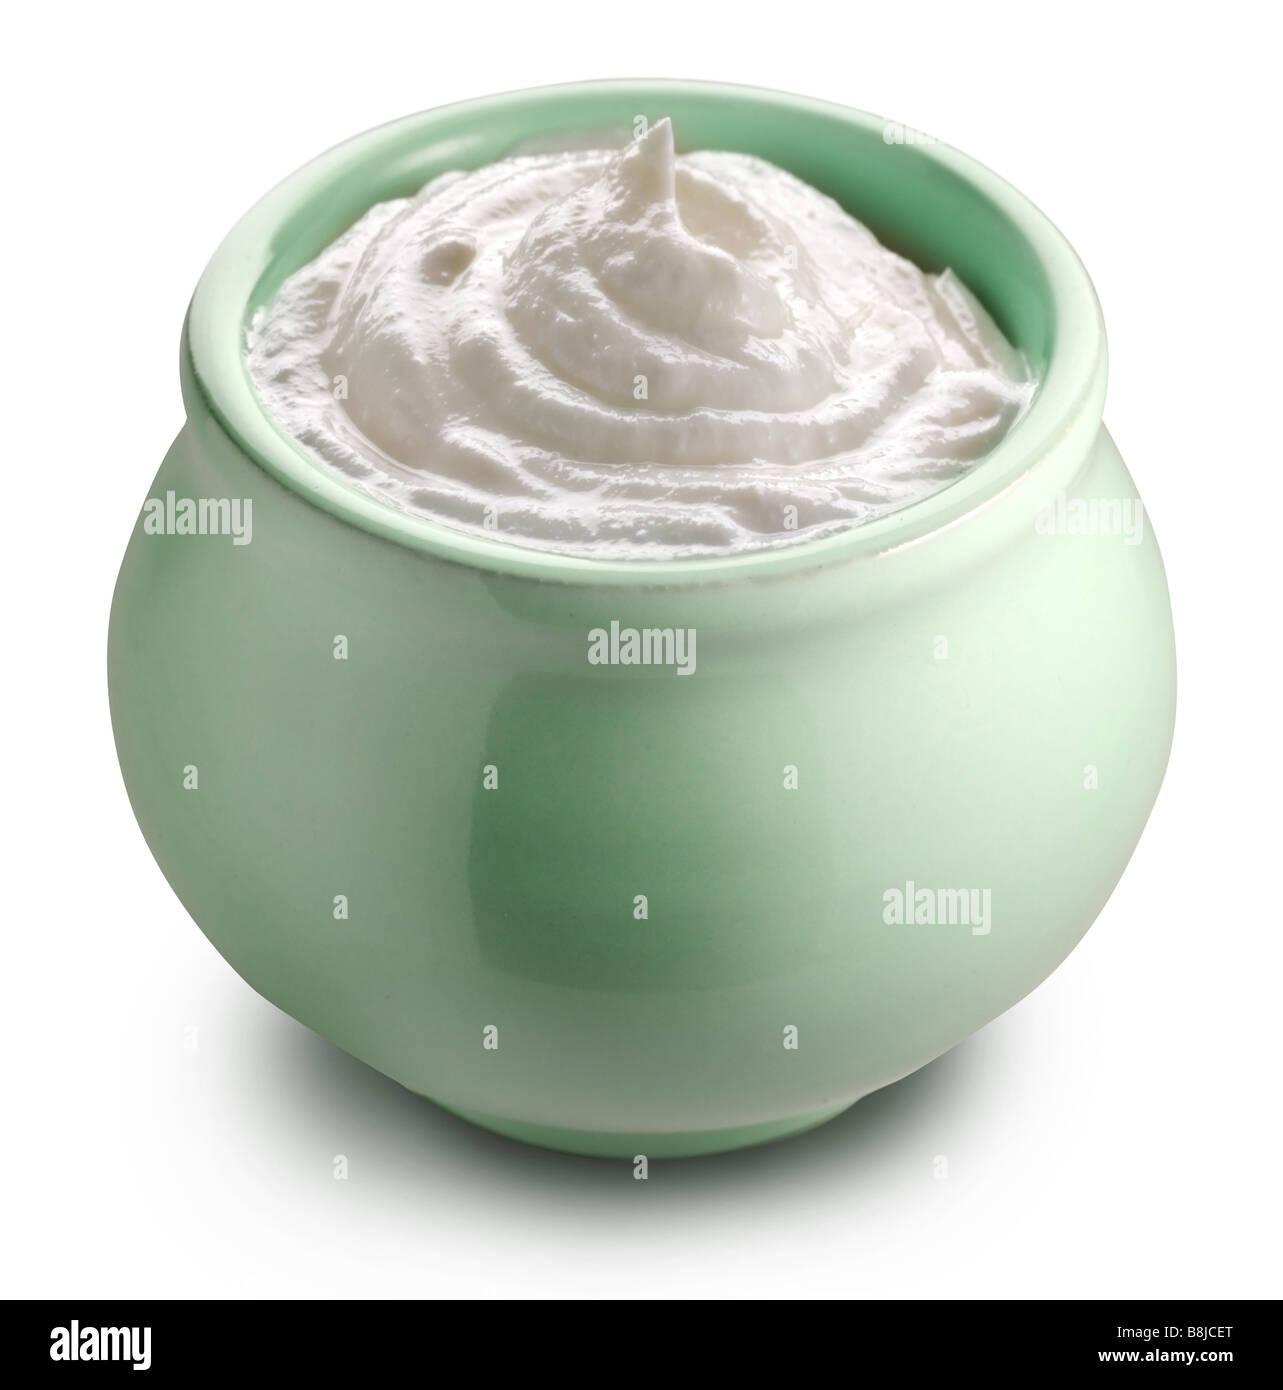 Pipkin with sour cream - Stock Image